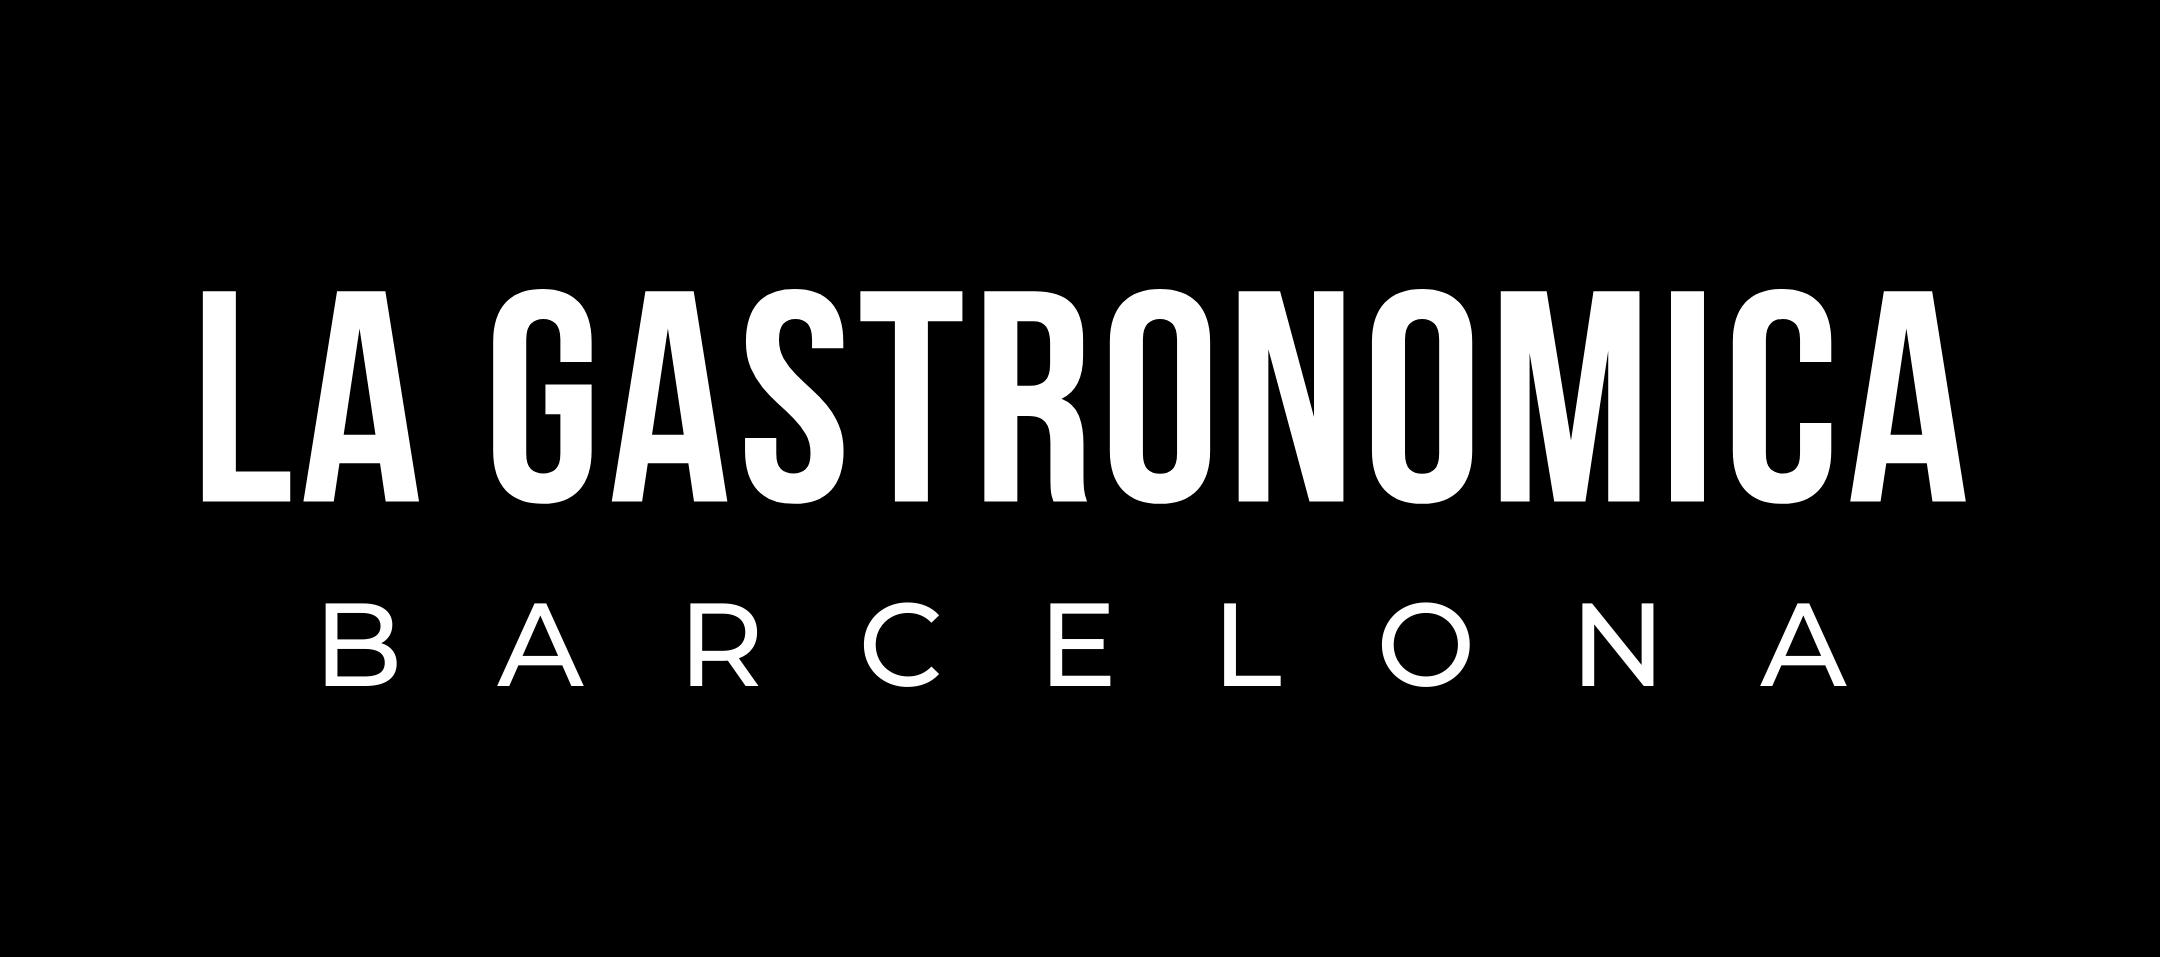 La Gastronomica Barcelona logo